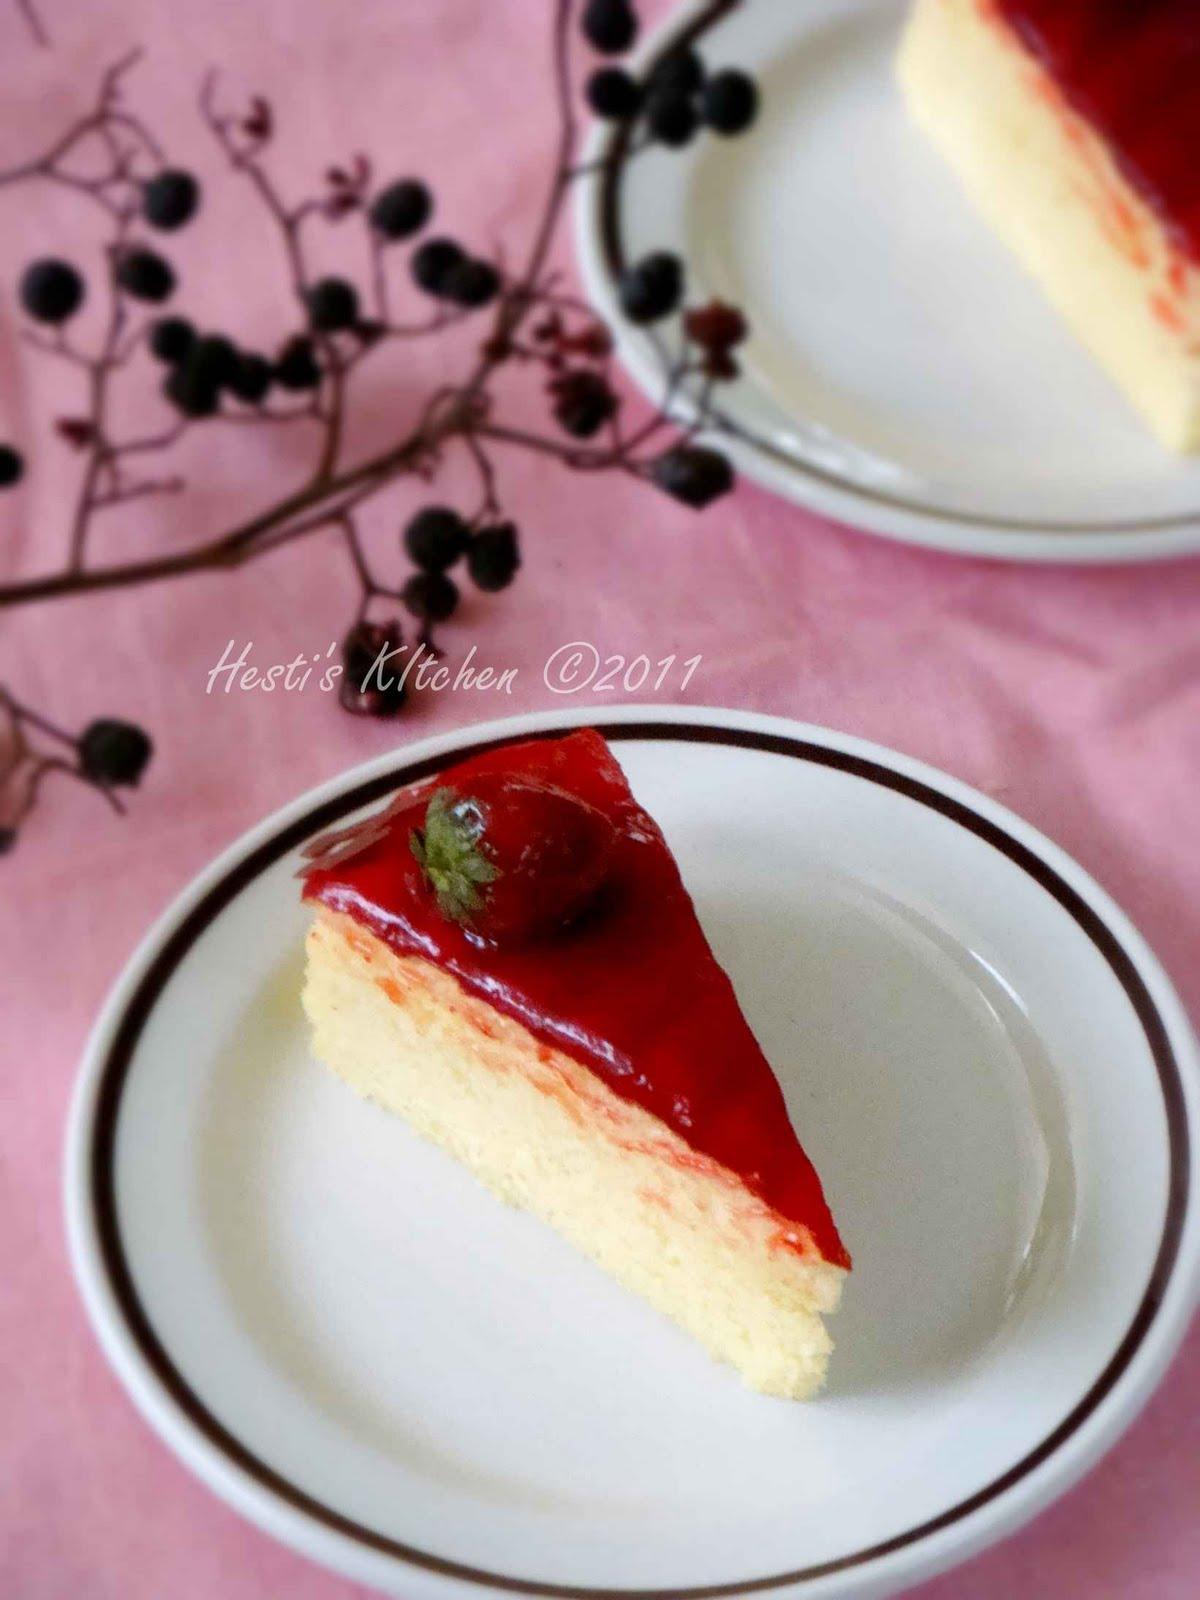 HESTI'S KITCHEN : yummy for your tummy: Strawberry Cheese